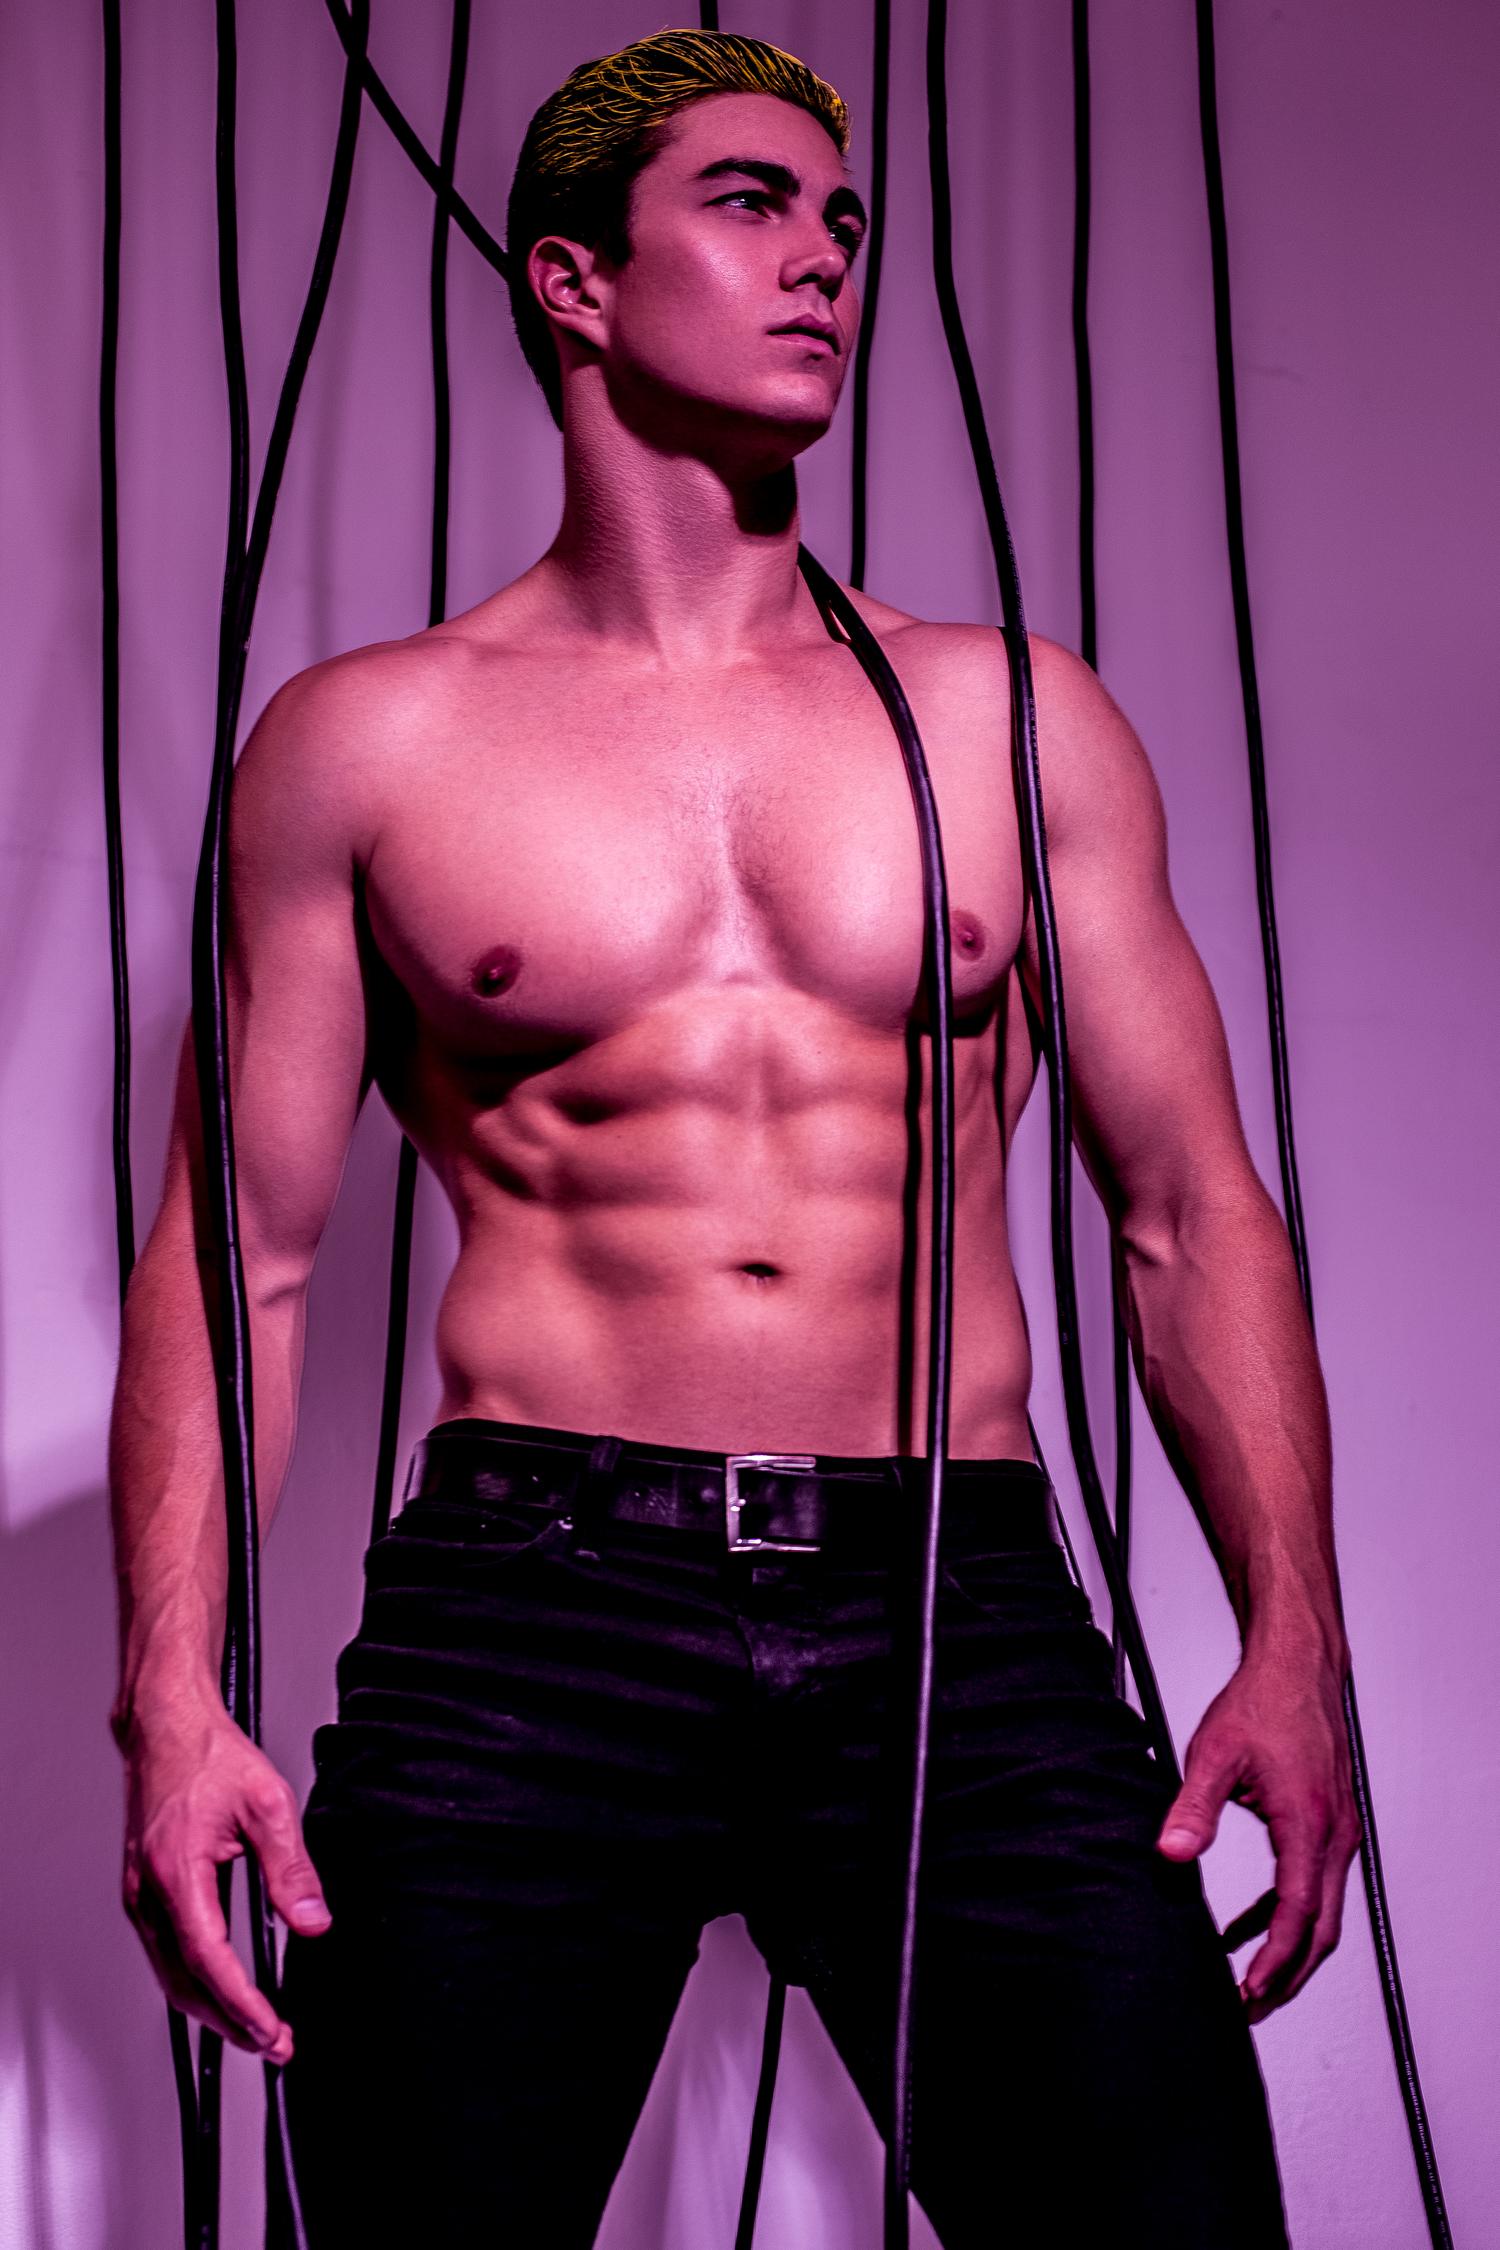 Adon Exclusive: Model Kyle Kriesel By Michael Clifford